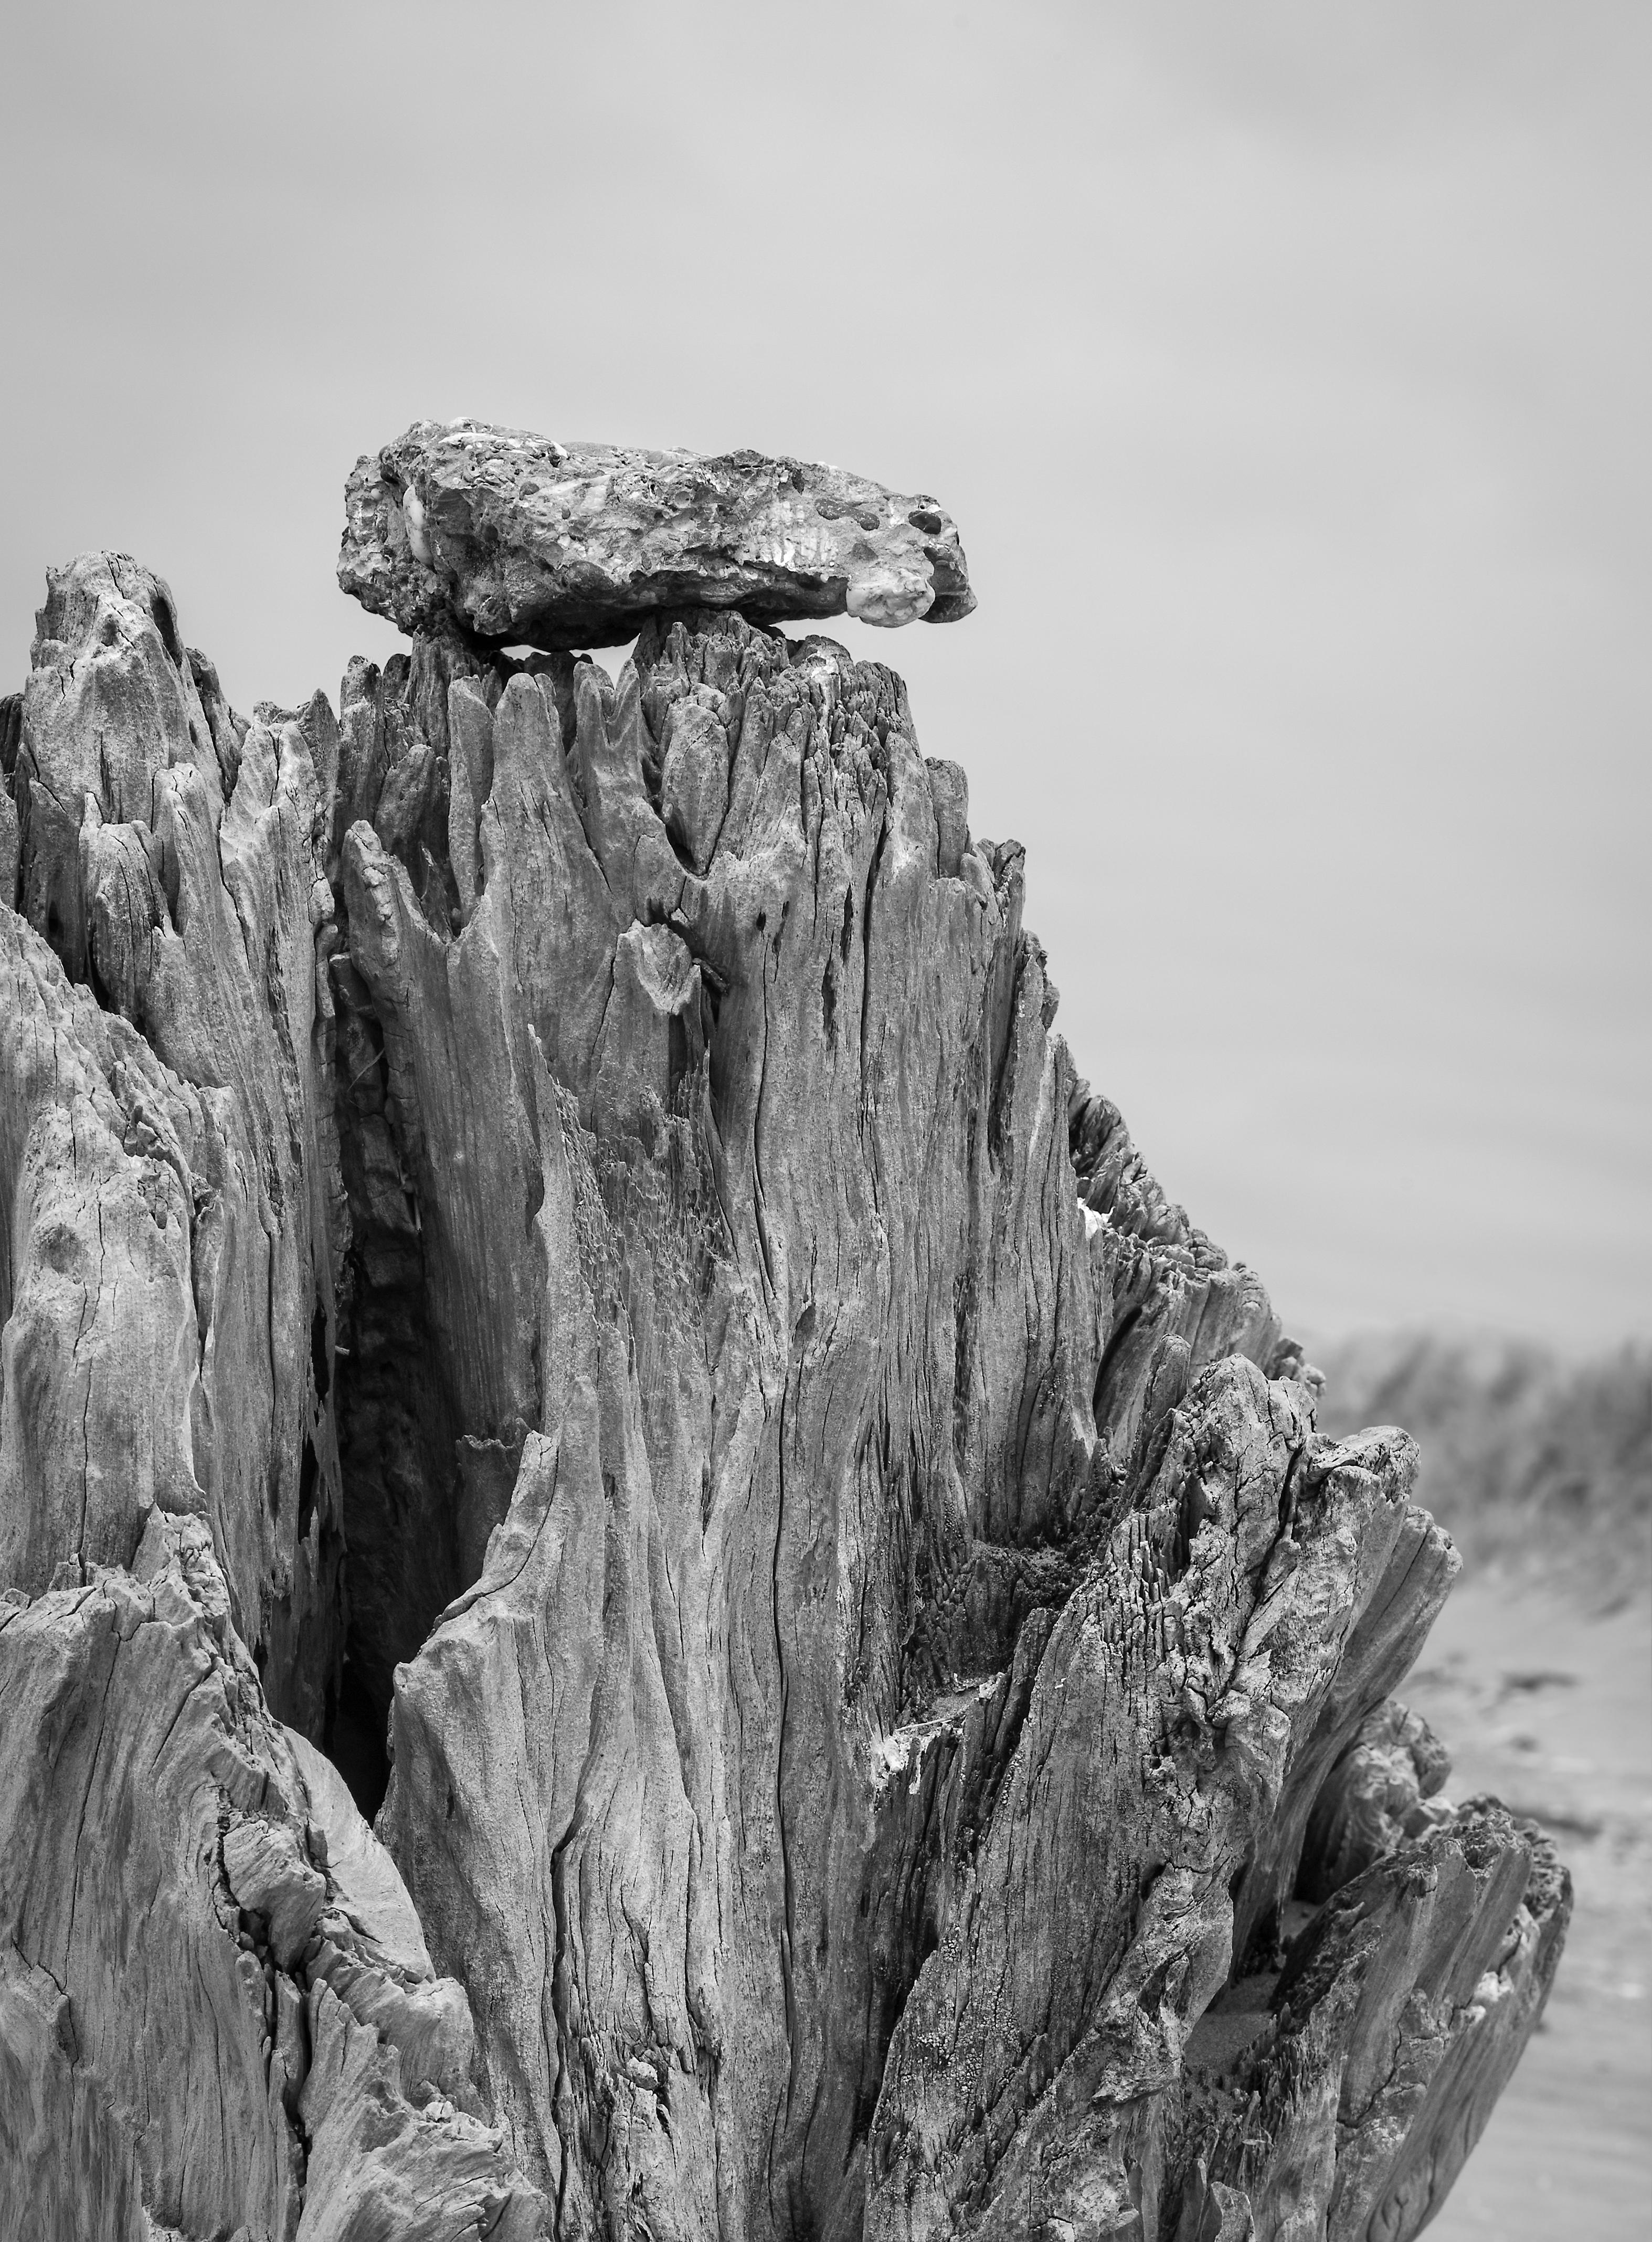 72 Gambar Abstrak Gunung Paling Keren